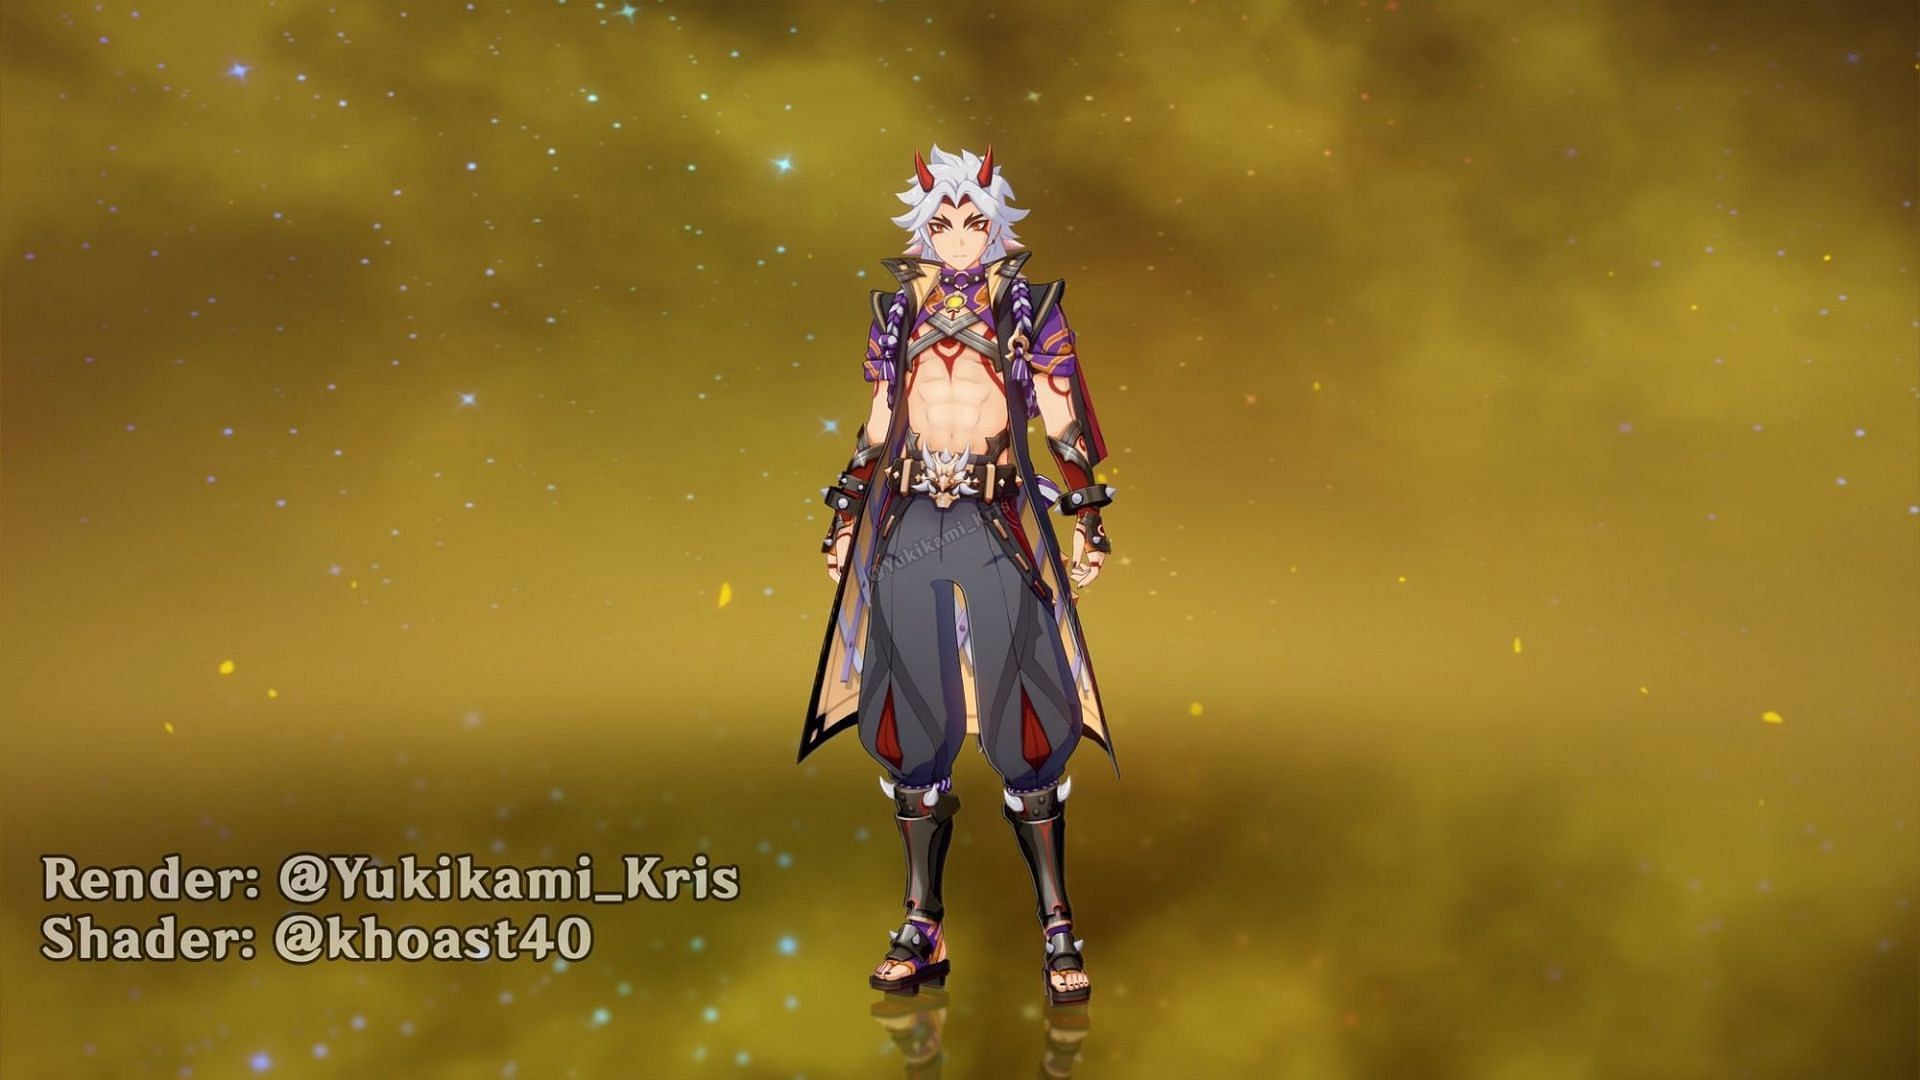 Another Itto render (Image via Yukikami_Kris)